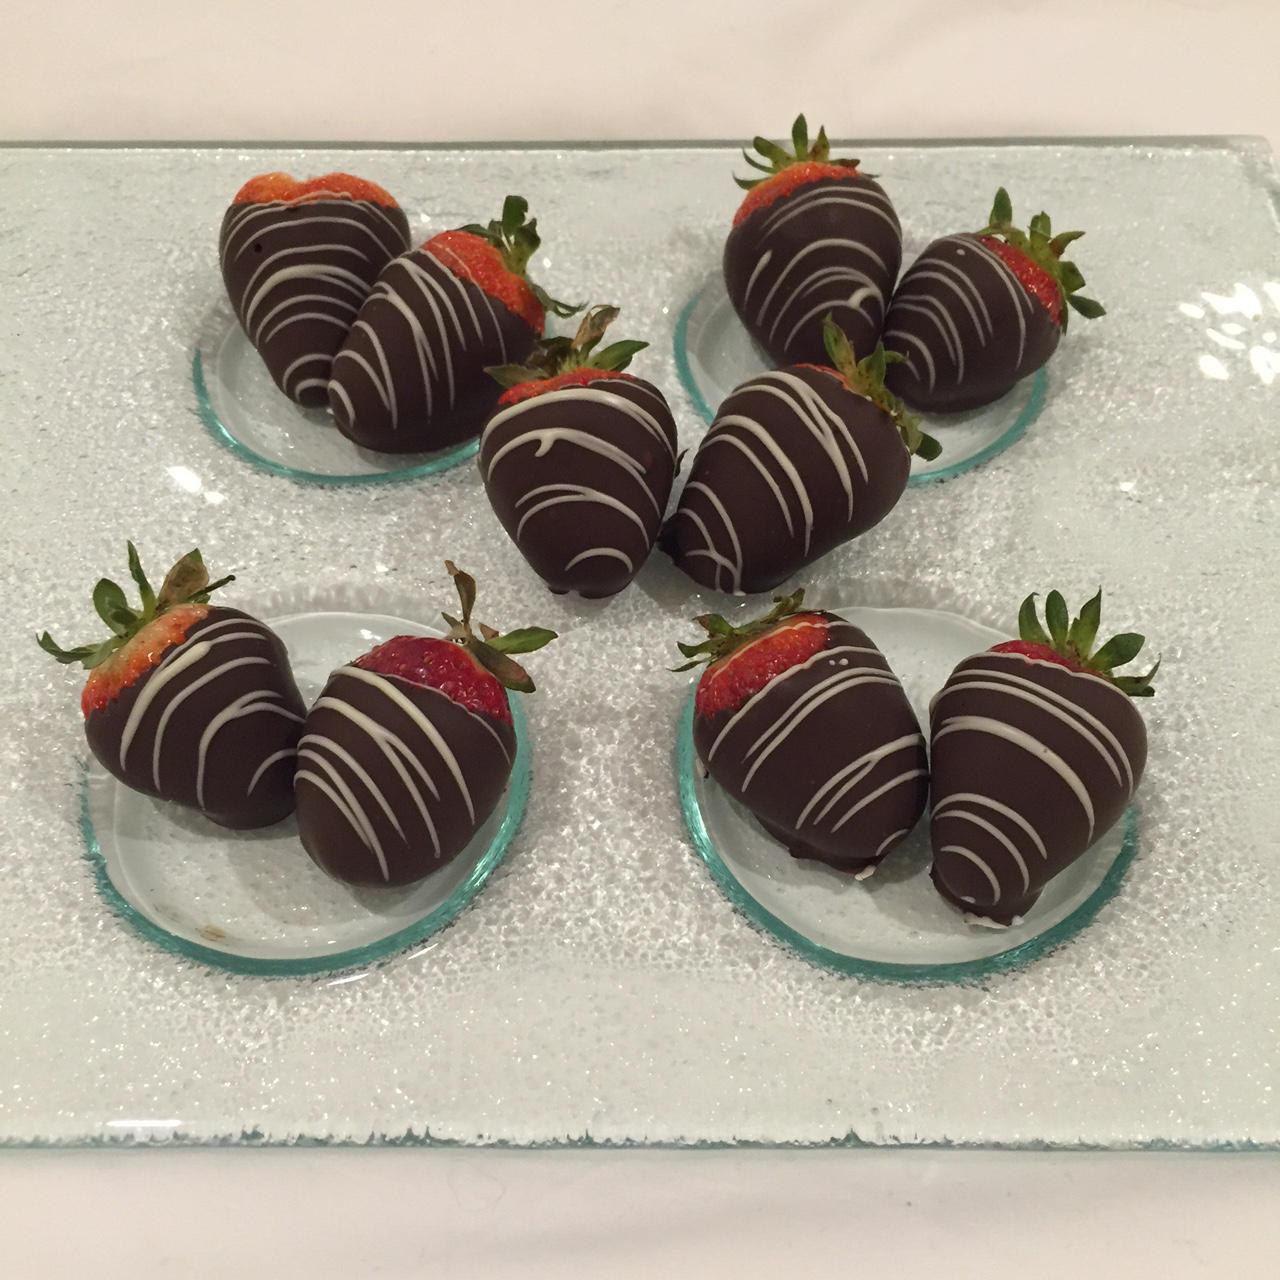 The Grove Hotel Chocolate Strawberries